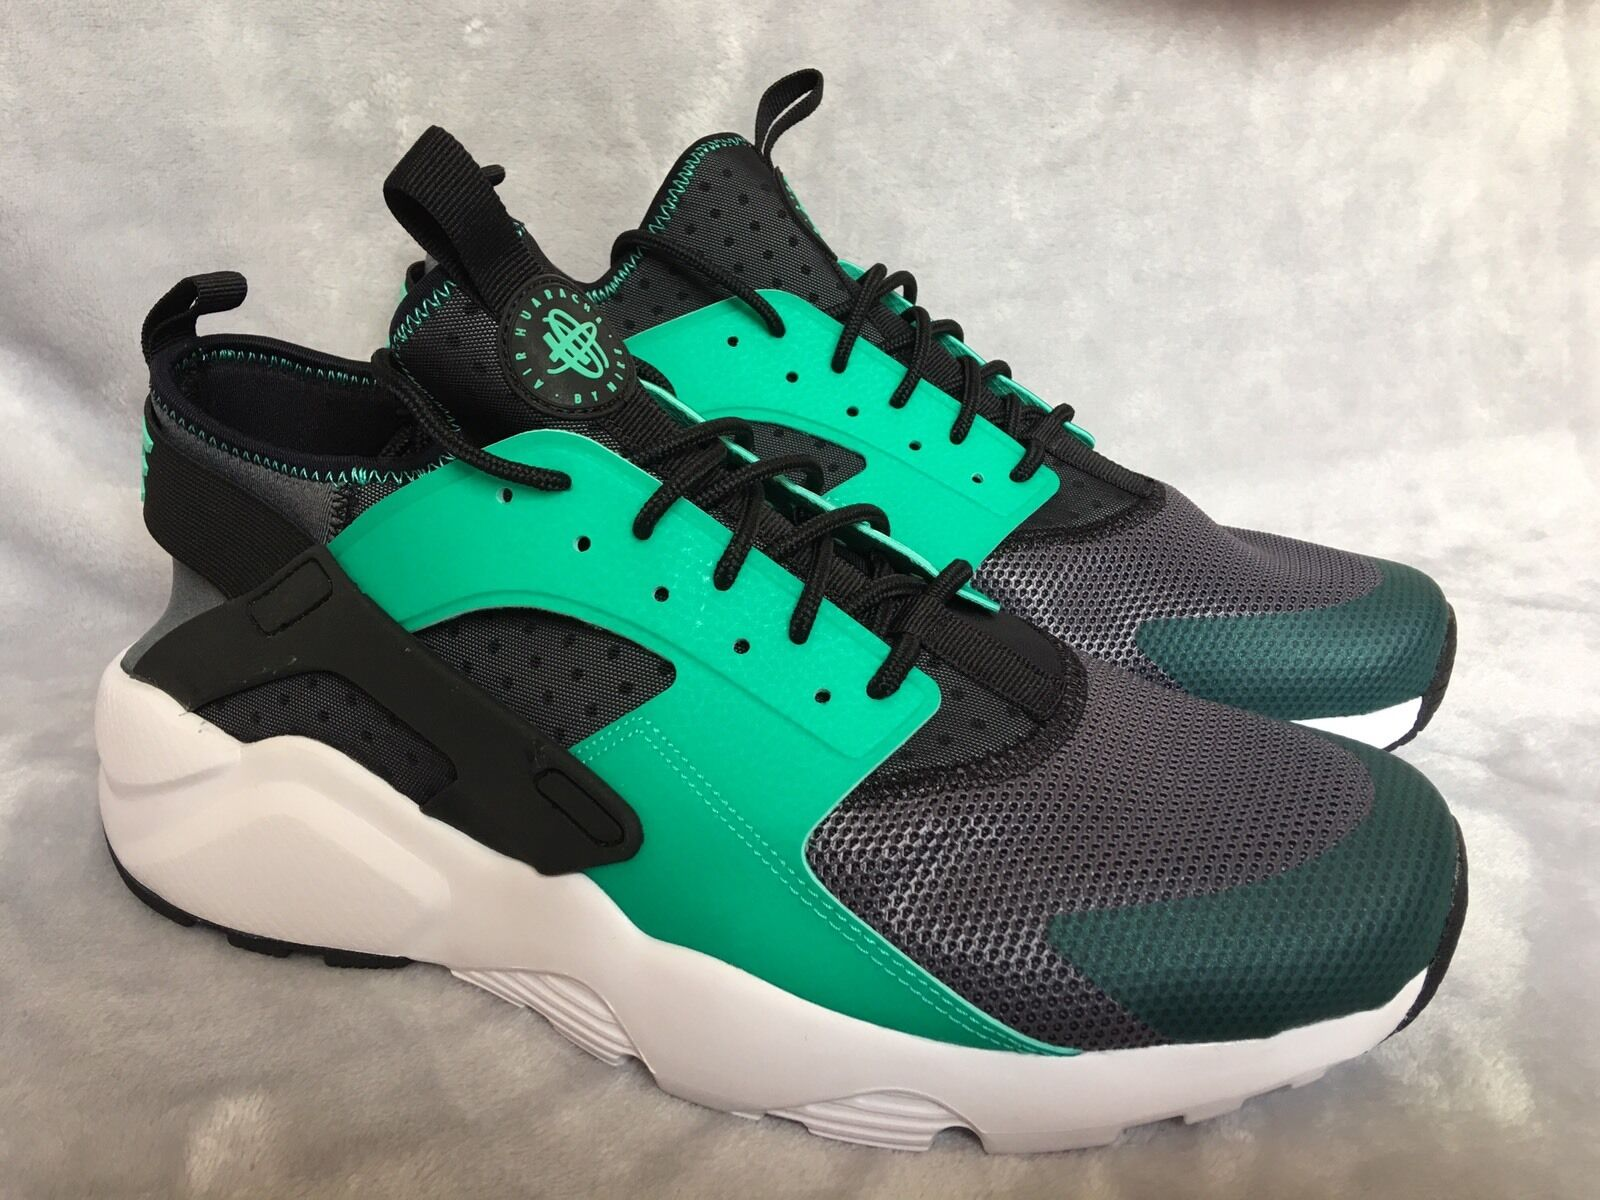 Nike Air Huarache Running Shoes Training Green Black 819685 003 Mens Size 13